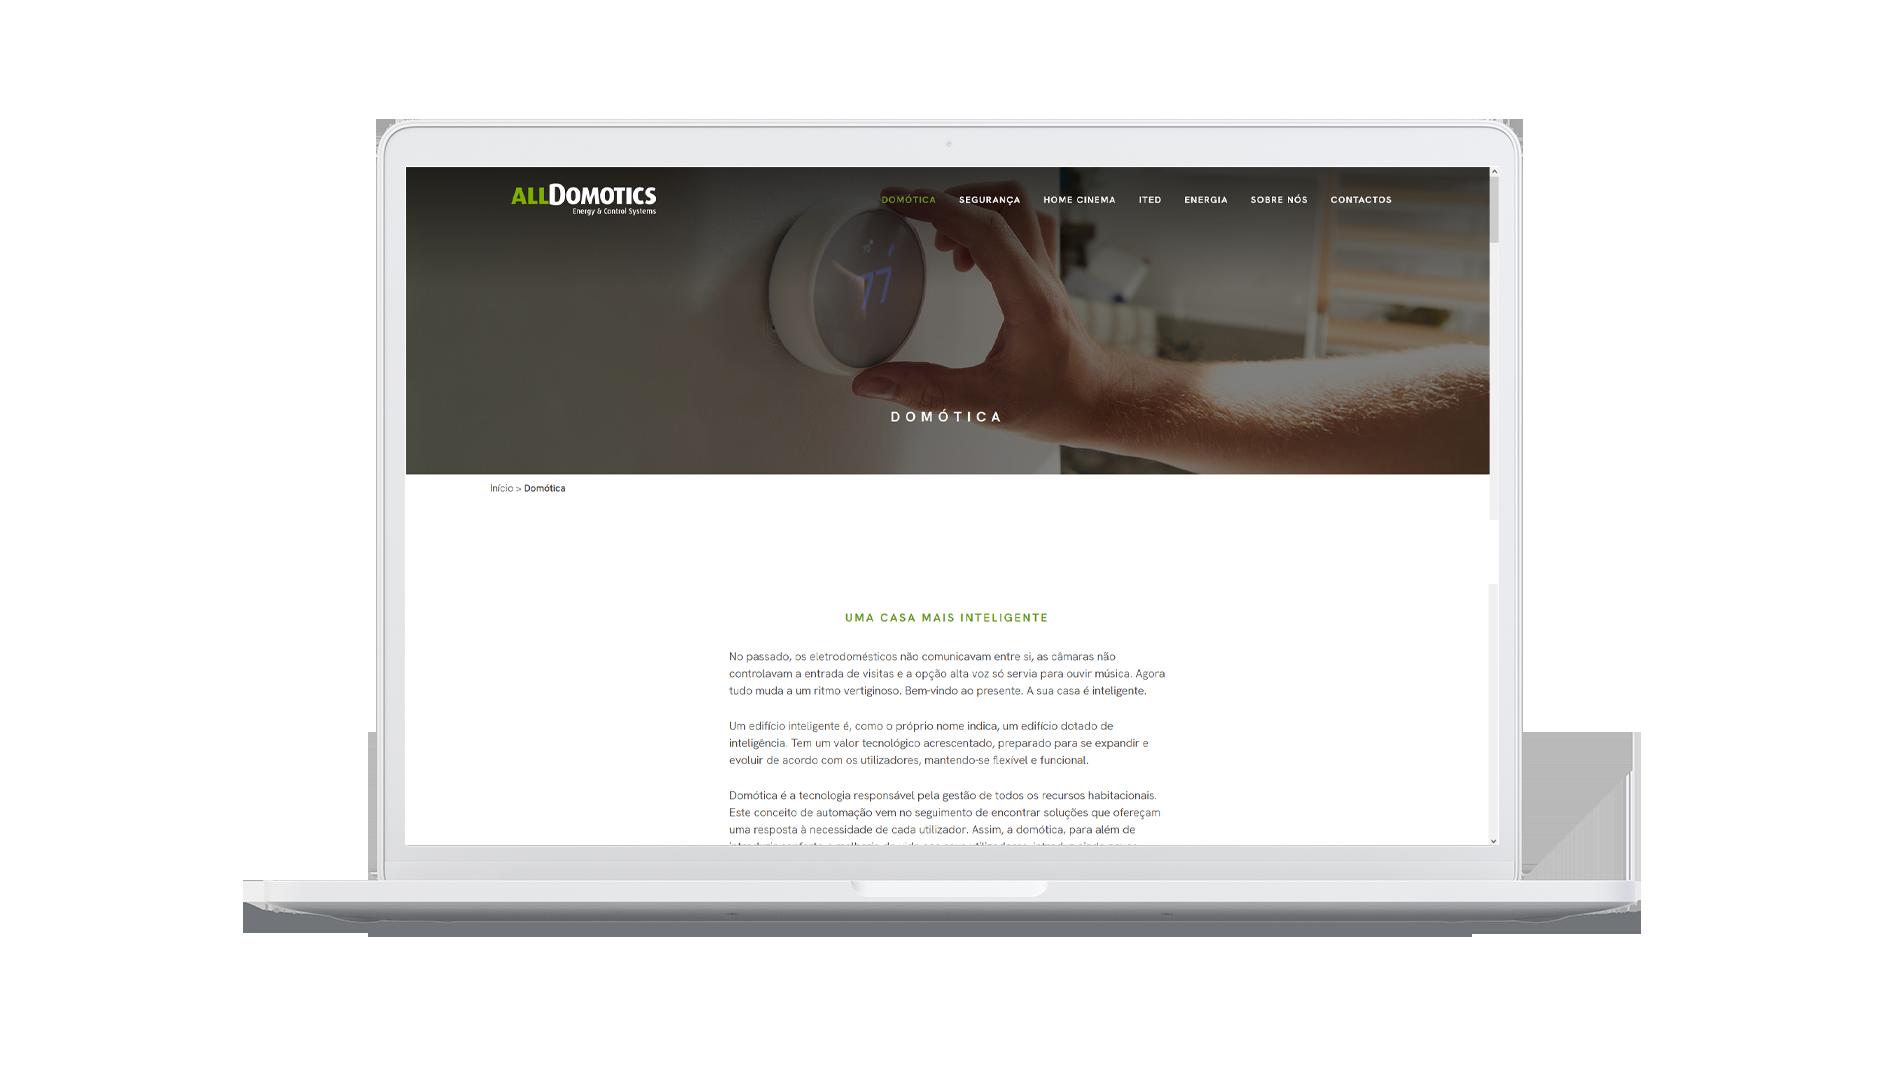 alldomotics website 08 21